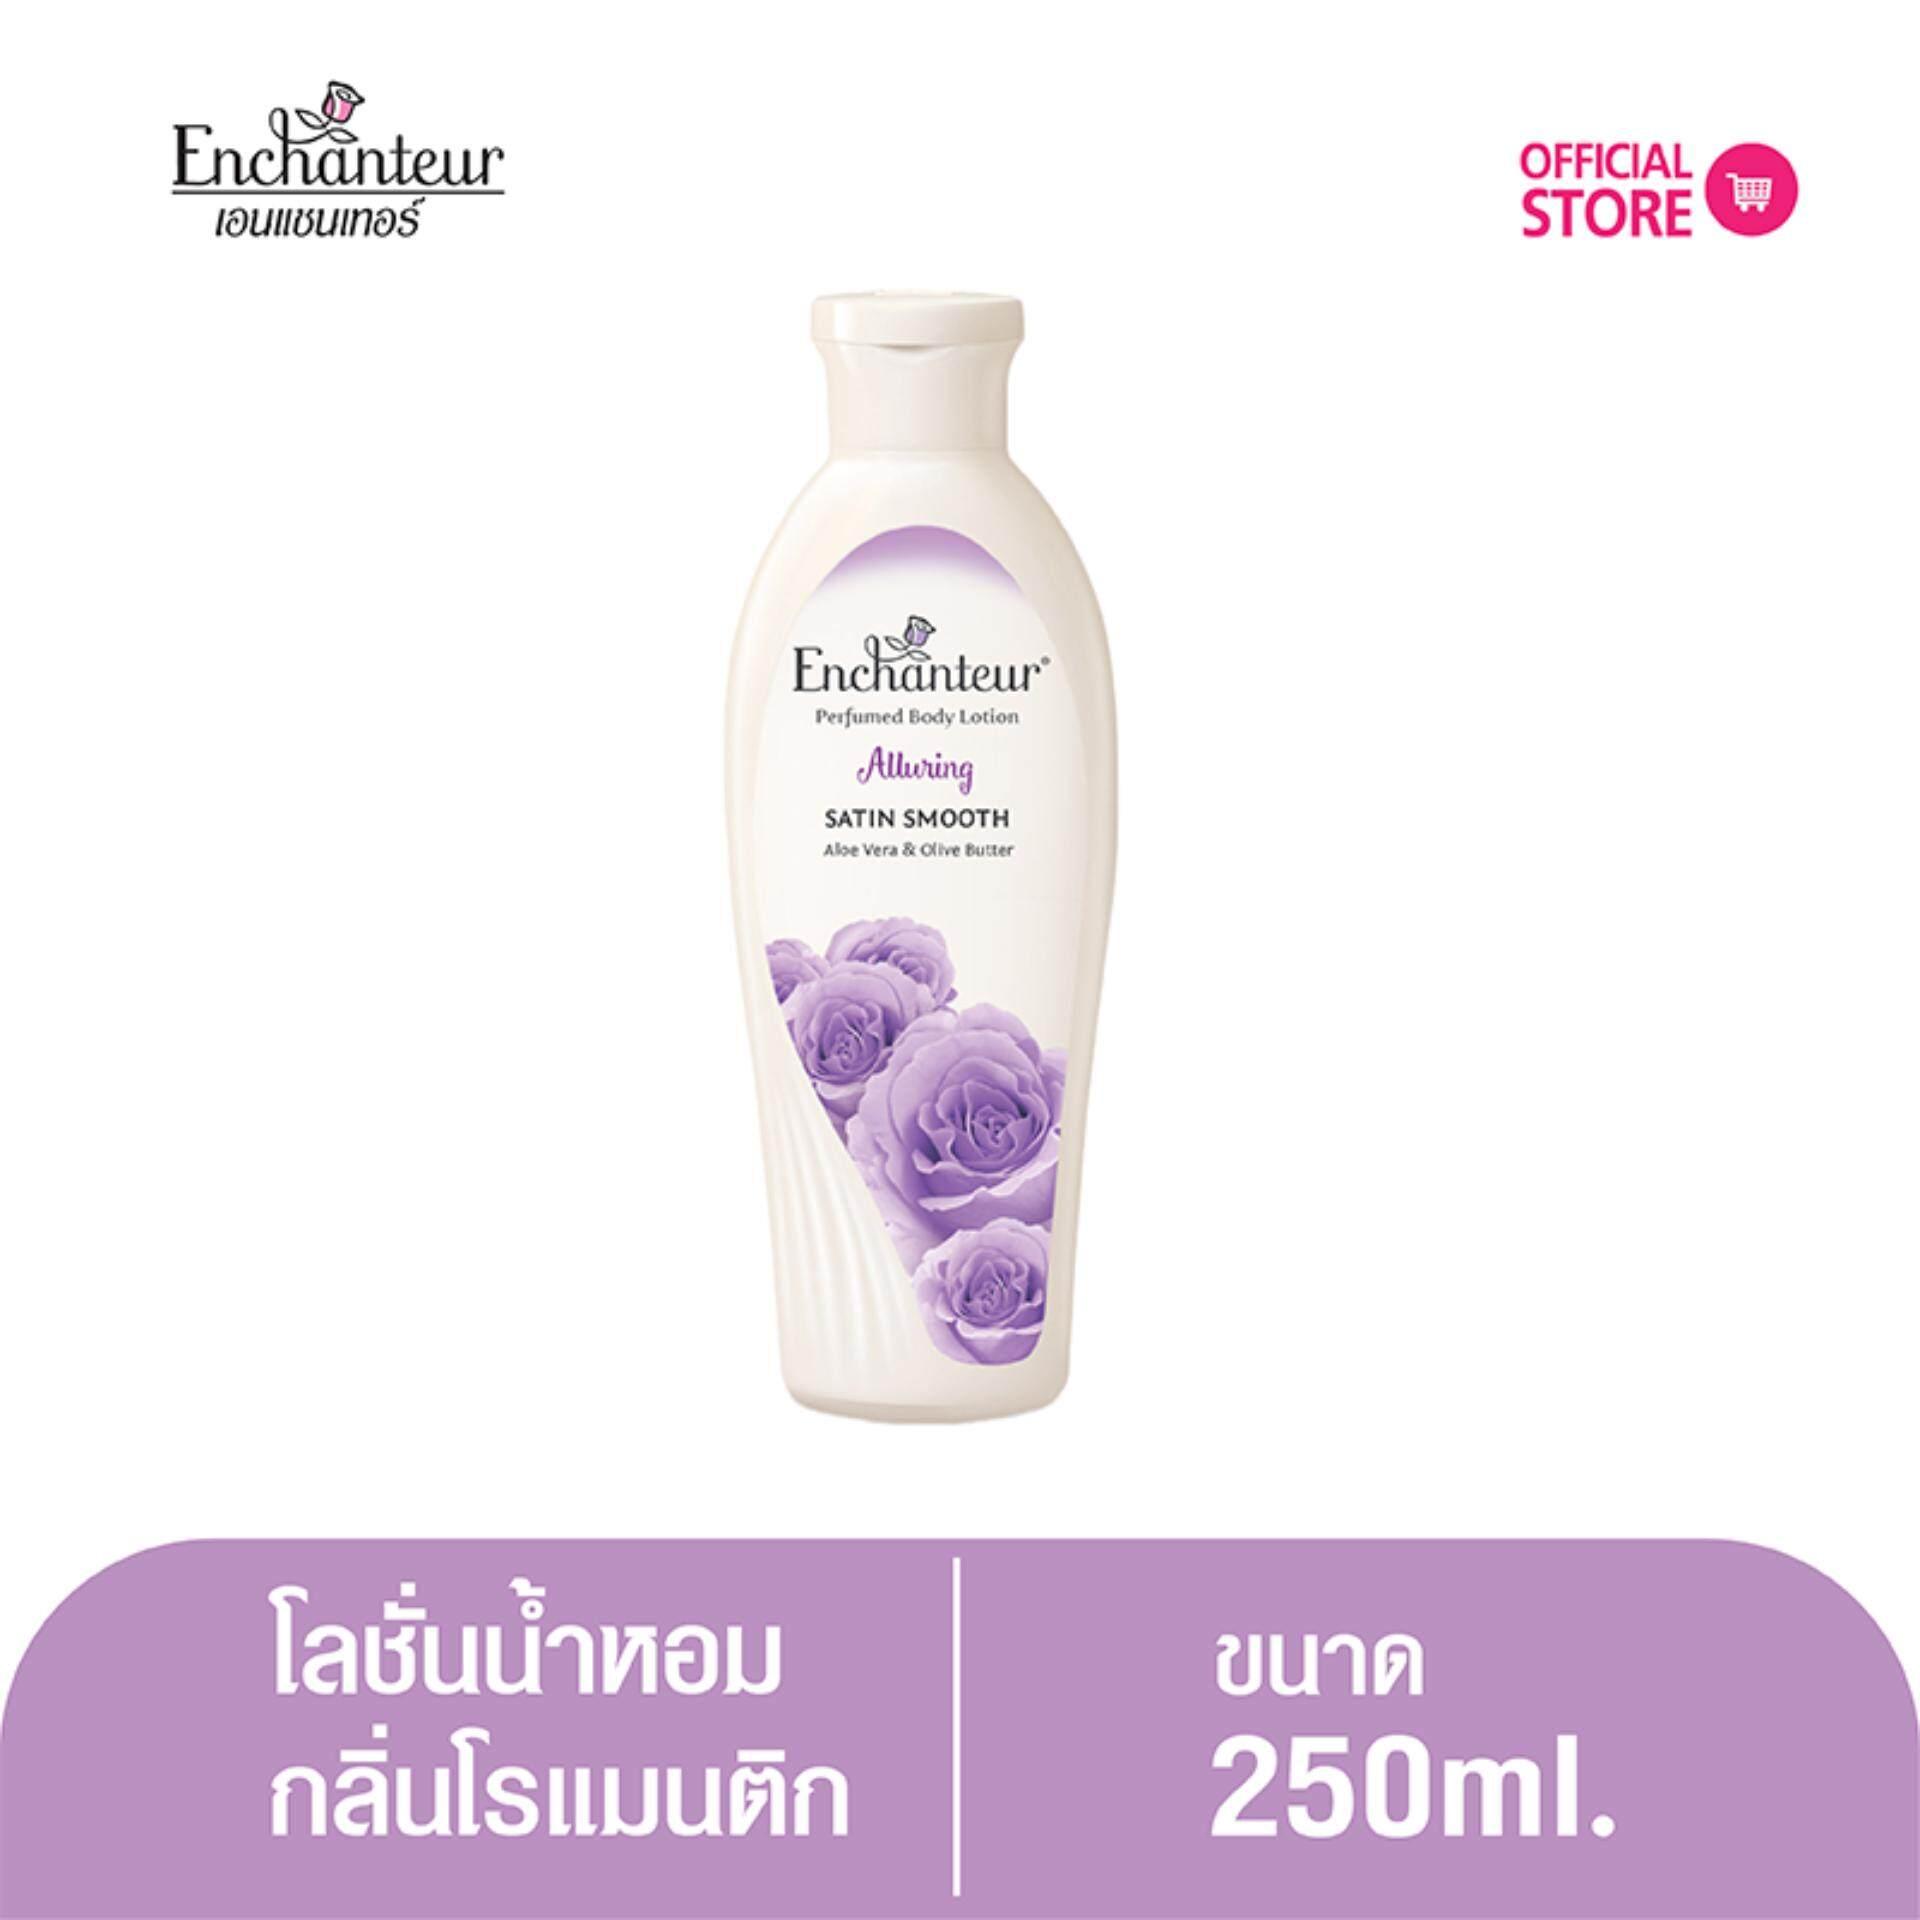 Enchanteur Thailand Perfumed Talc Alluring 200a 250